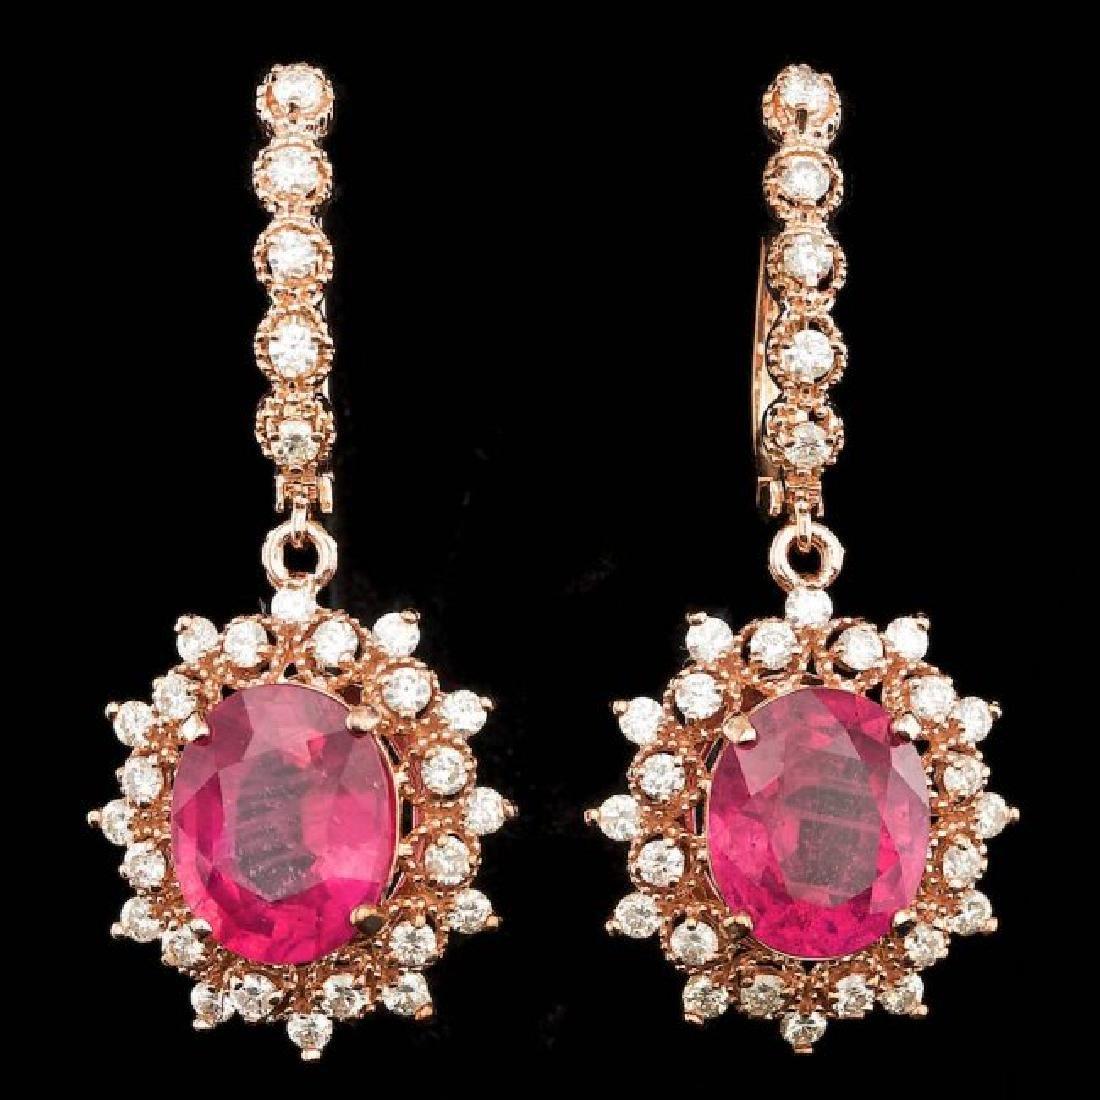 14k Rose Gold 9.00ct Ruby 1.60ct Diamond Earrings